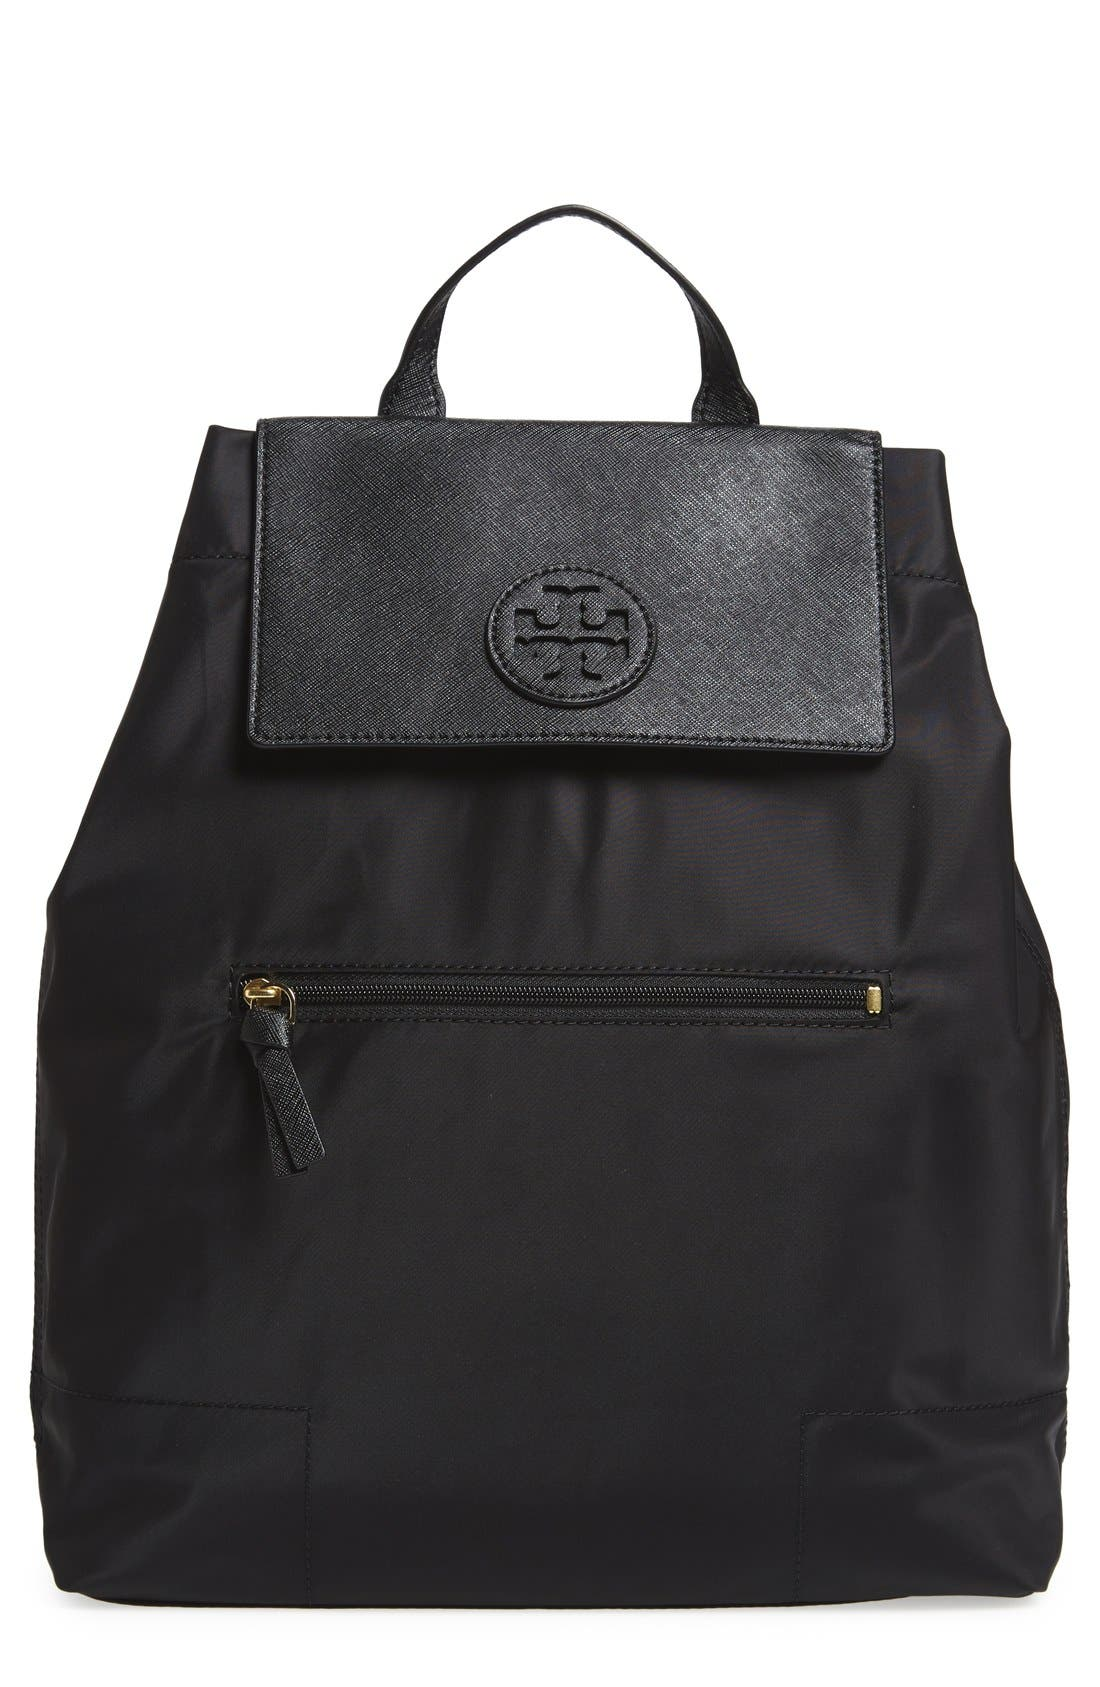 Main Image - Tory Burch 'Ella' Packable Nylon Backpack